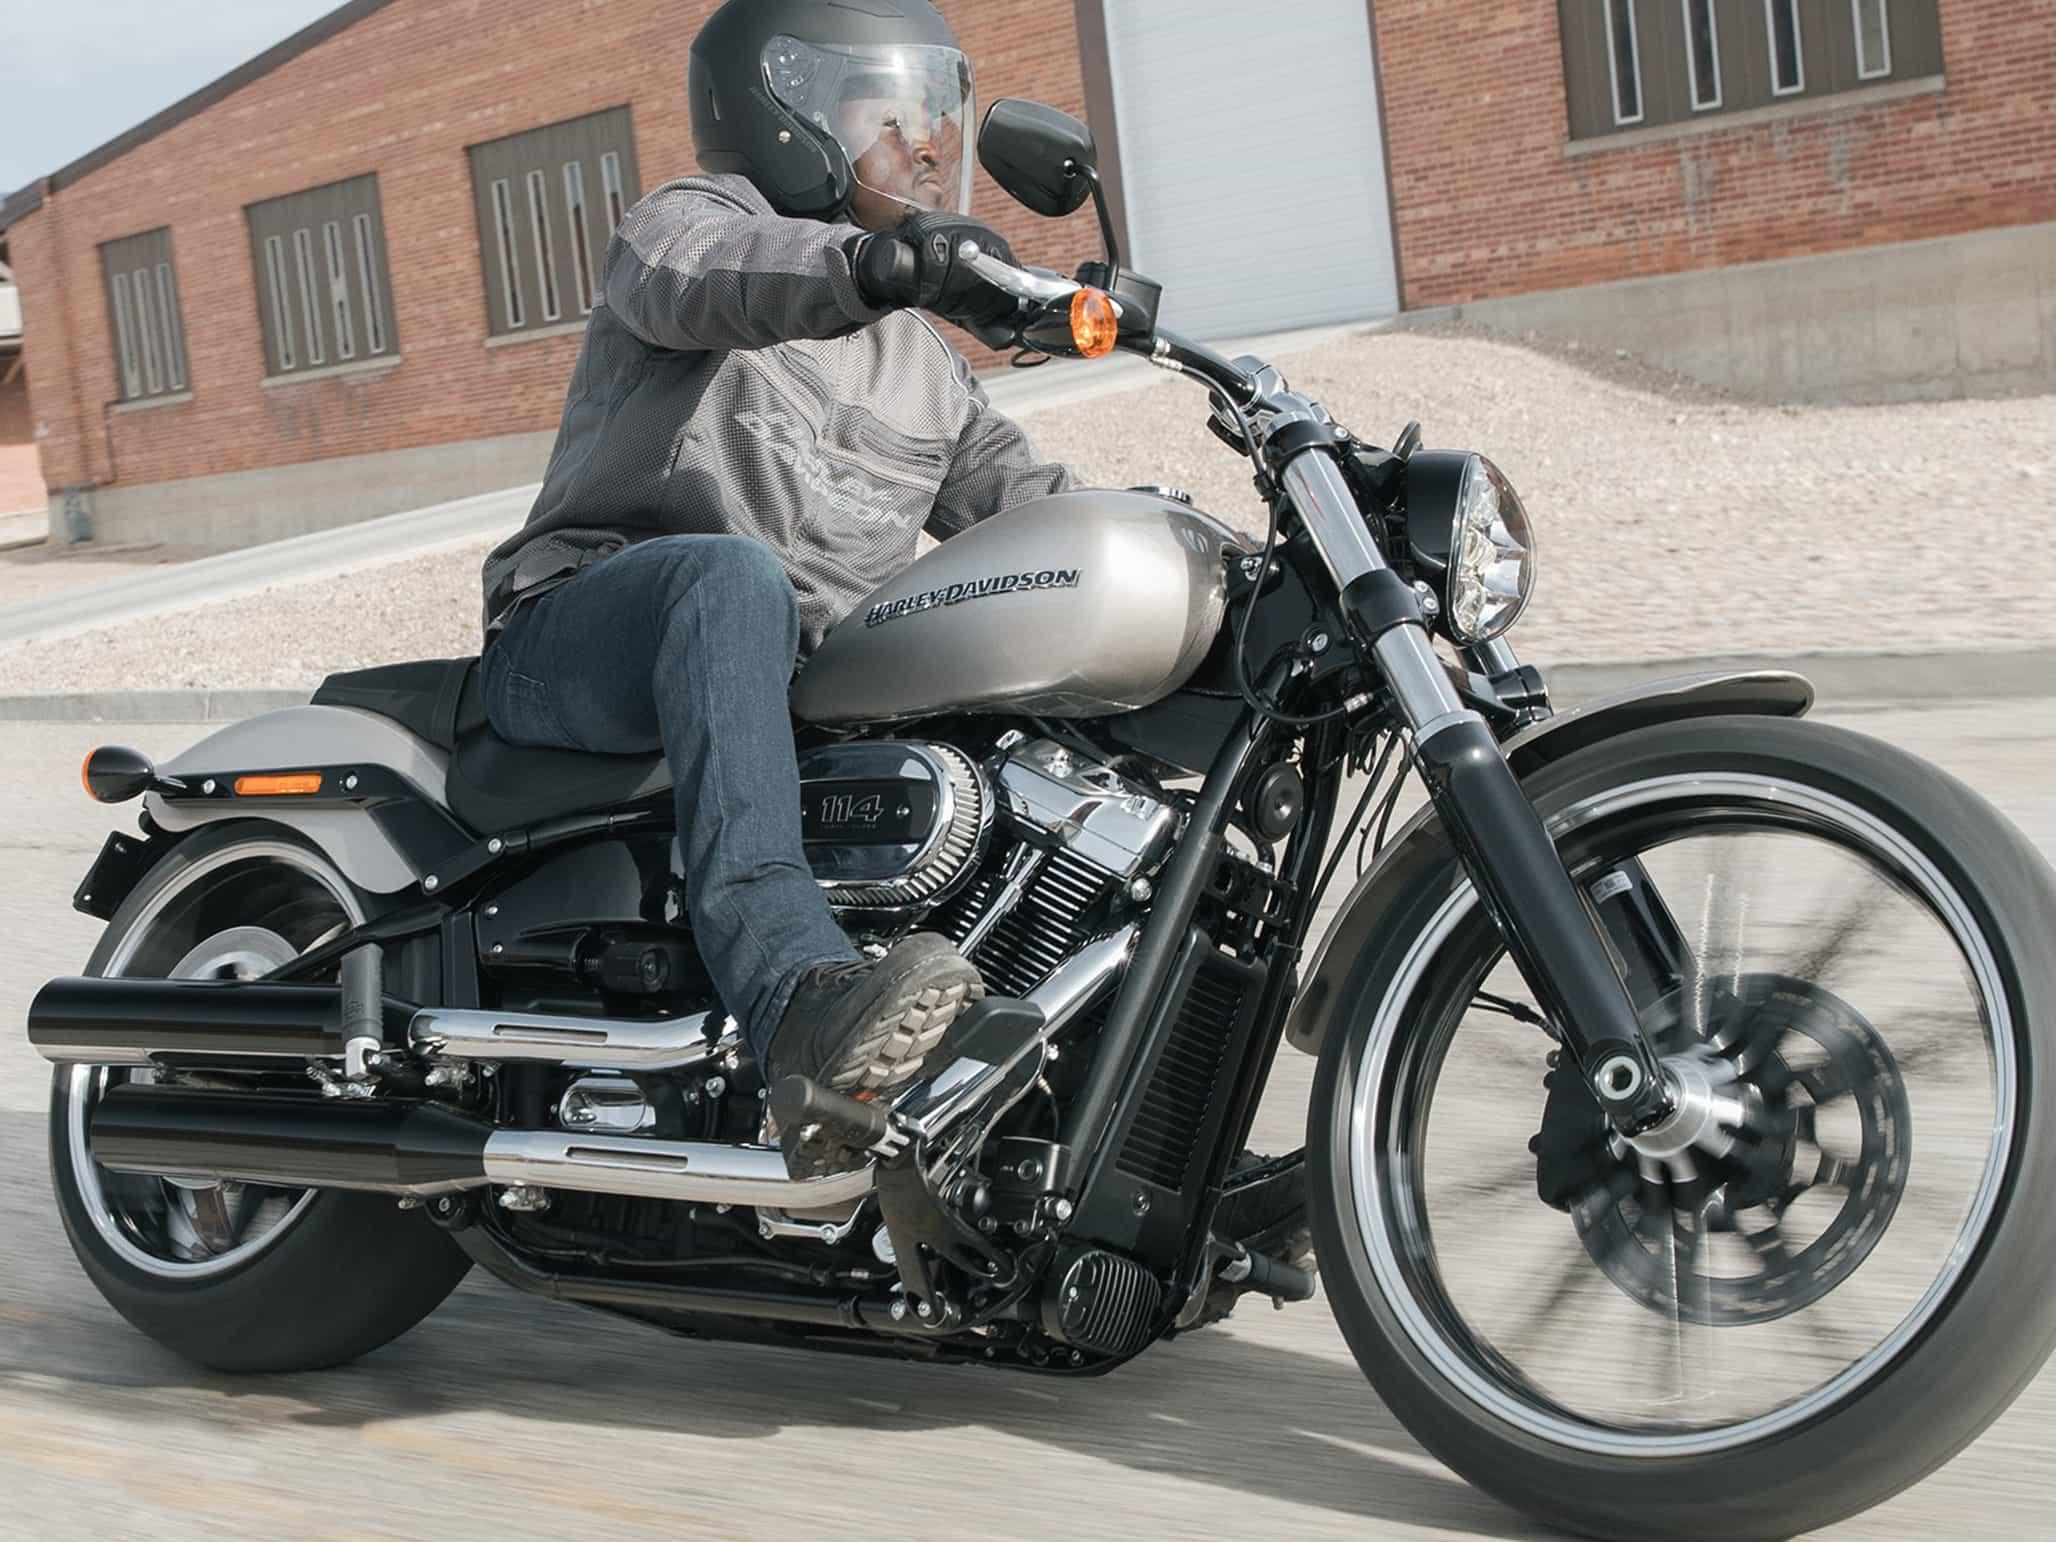 Exceptionnel Harley Davidson